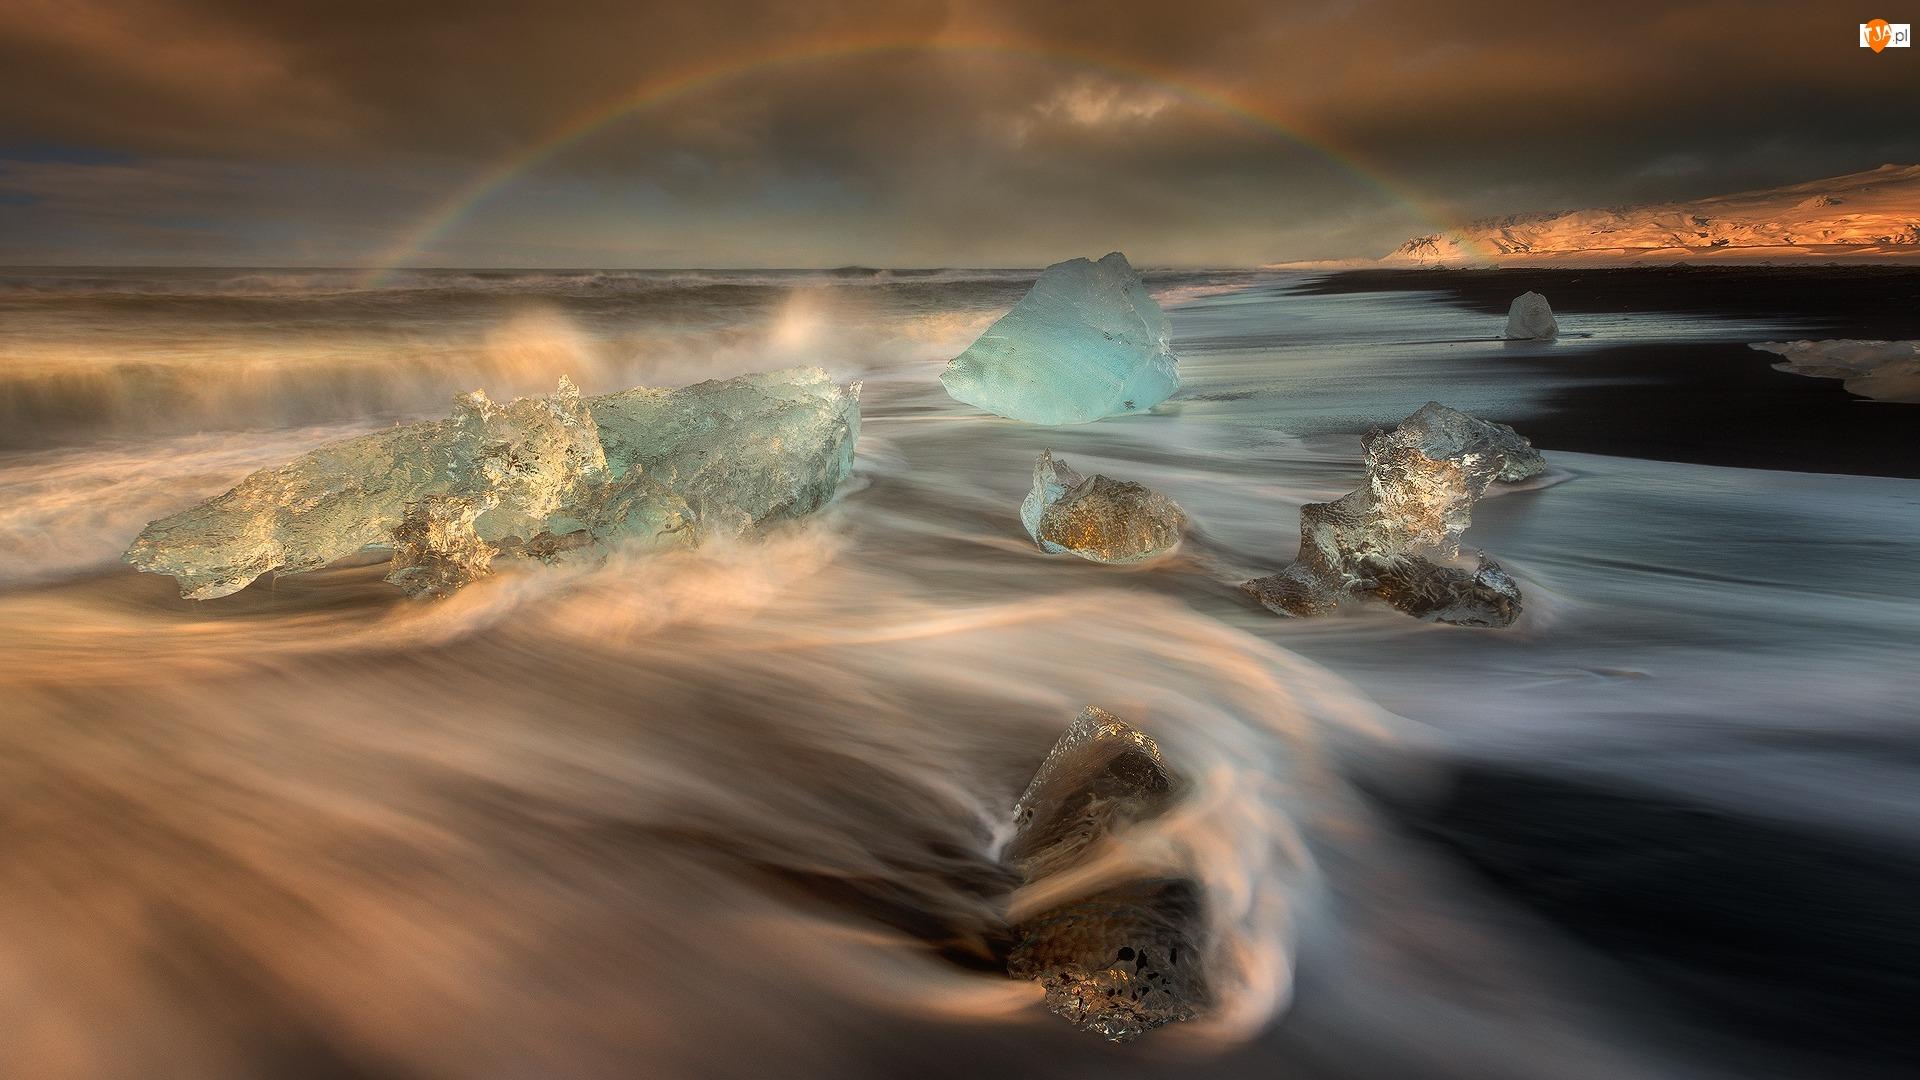 Tęcza, Islandia, Bryły, Morze, Lód